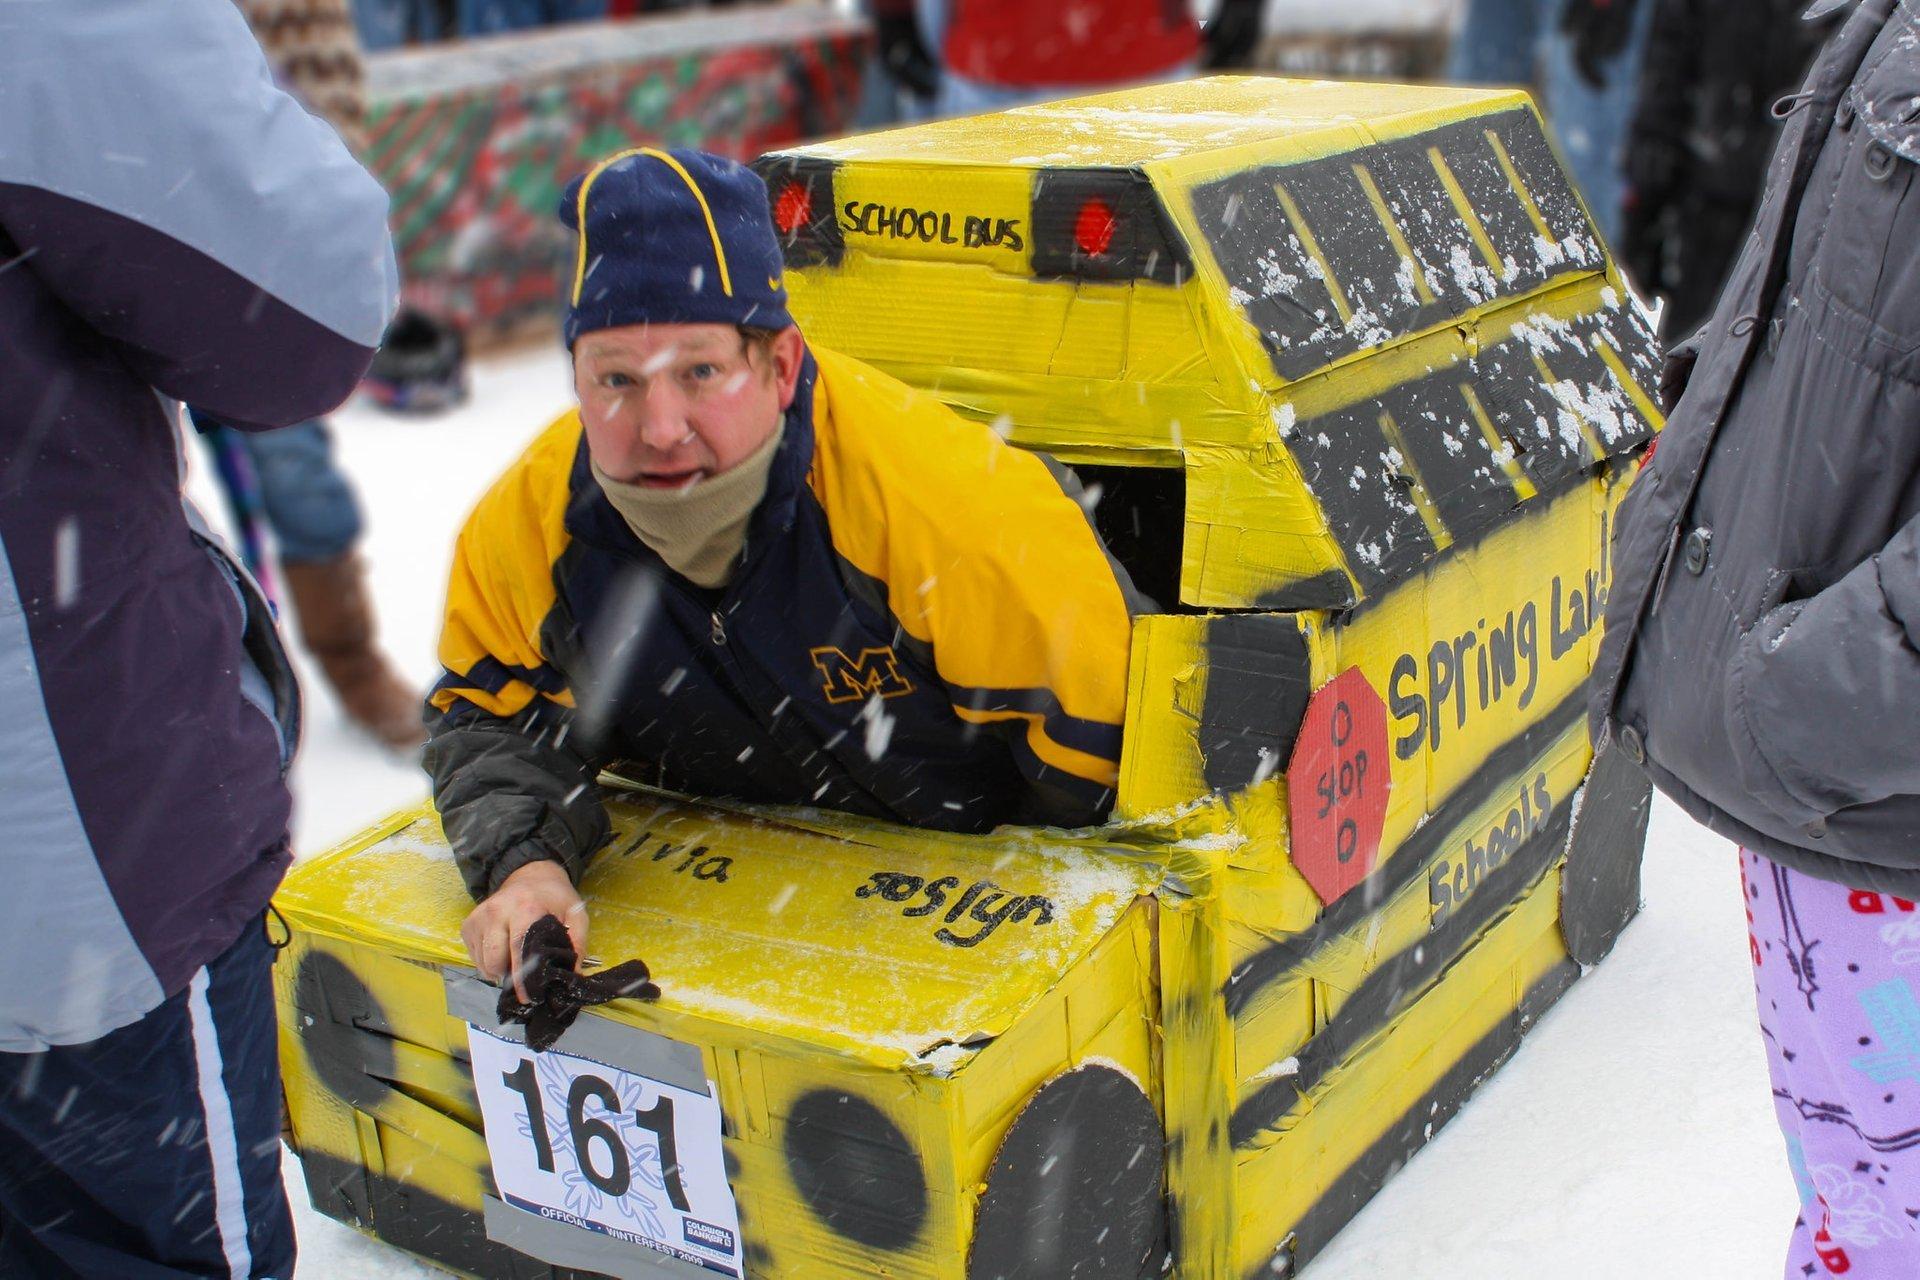 Cardboard Sled Race 2020